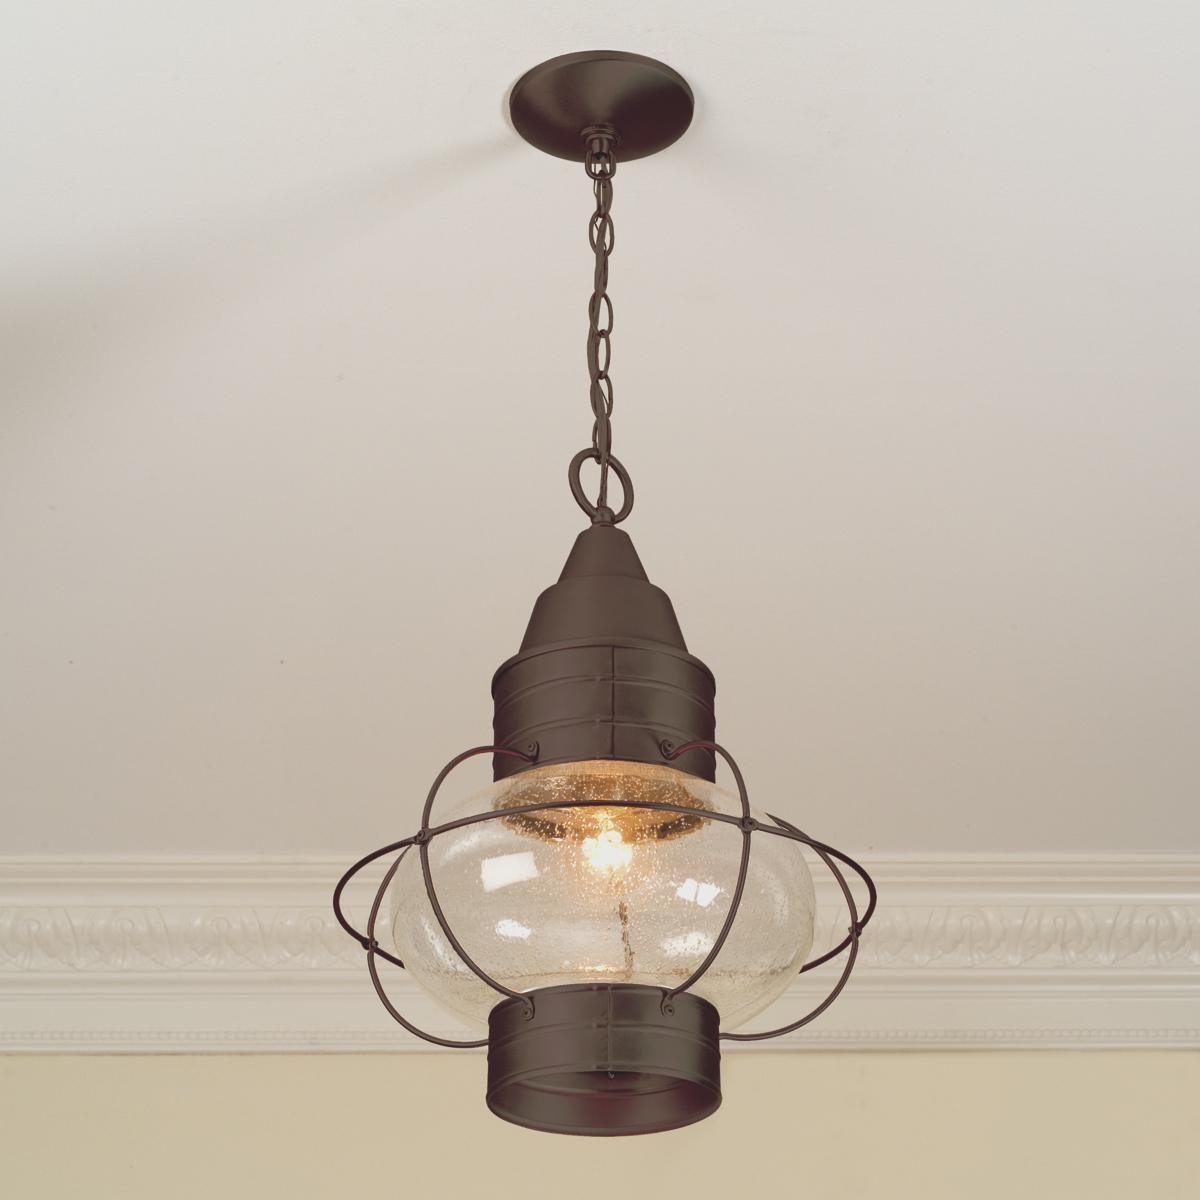 Nautical Hanging Lantern Shades Of Light Lantern Light Fixture Hanging Lantern Lights Hanging Lanterns